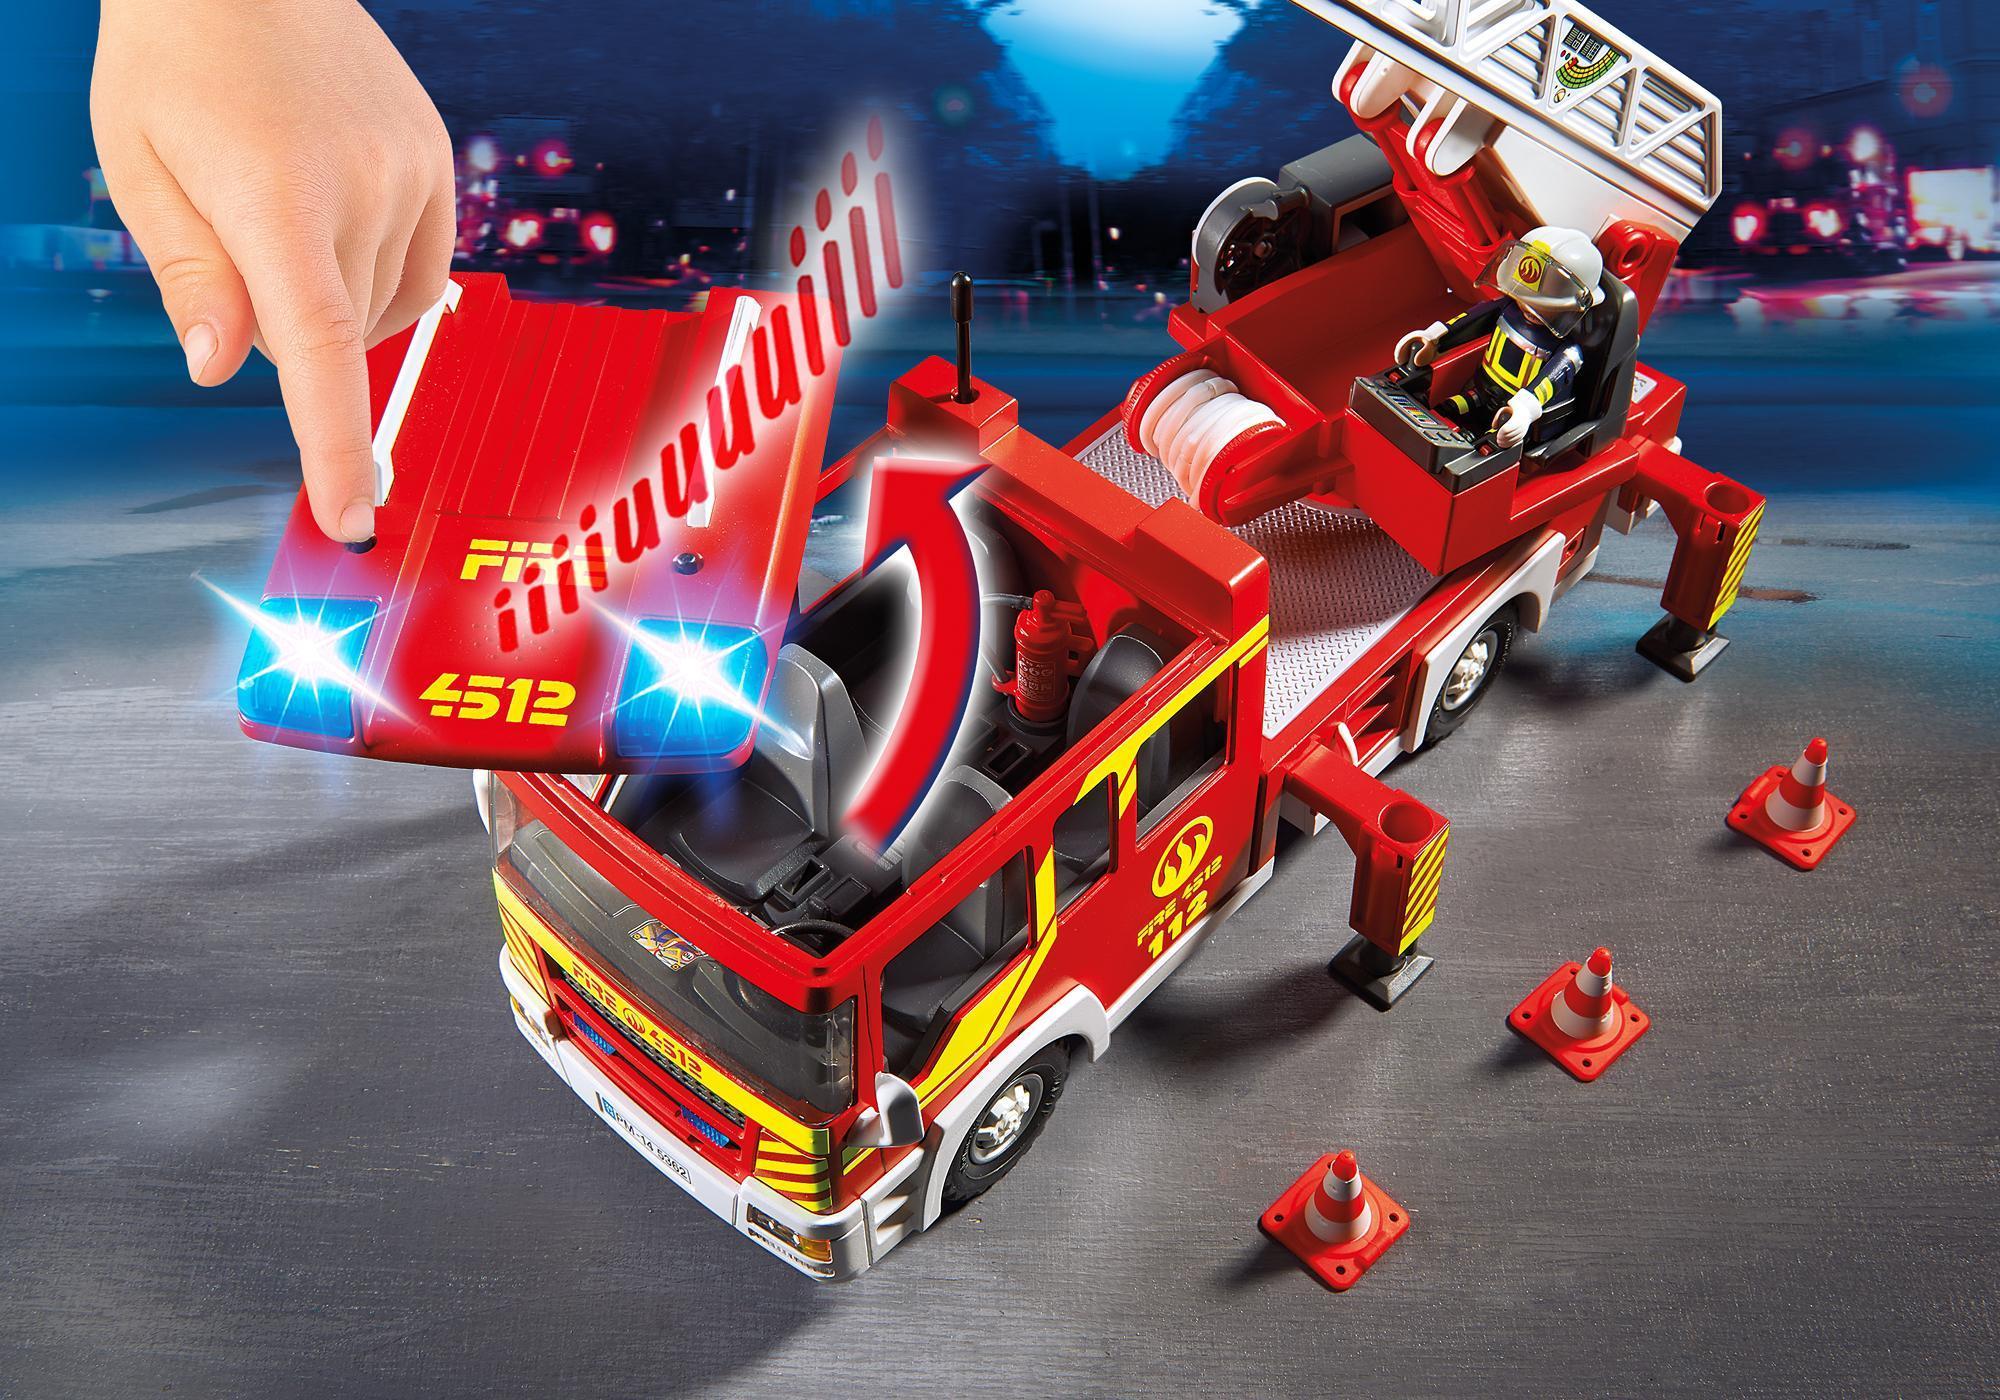 http://media.playmobil.com/i/playmobil/5362_product_extra1